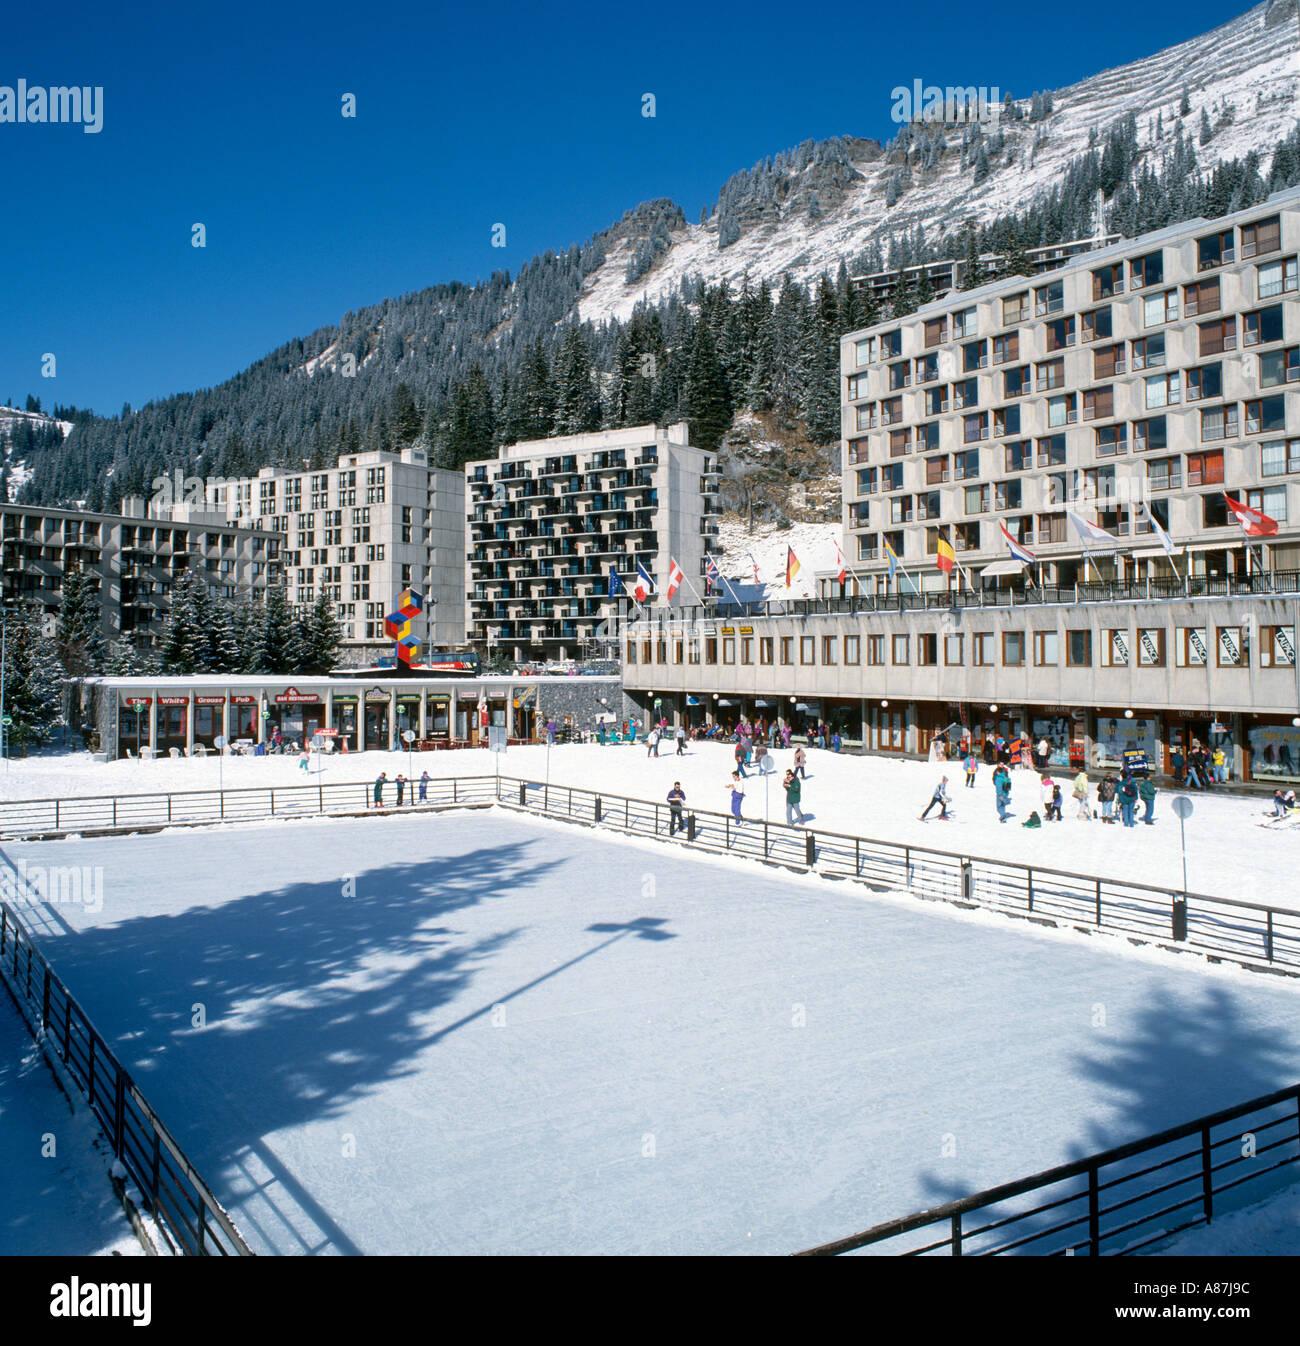 Skating Rink in Flaine Forum, Flaine, Grand Massif Ski Region, Haute Savoie, France Stock Photo